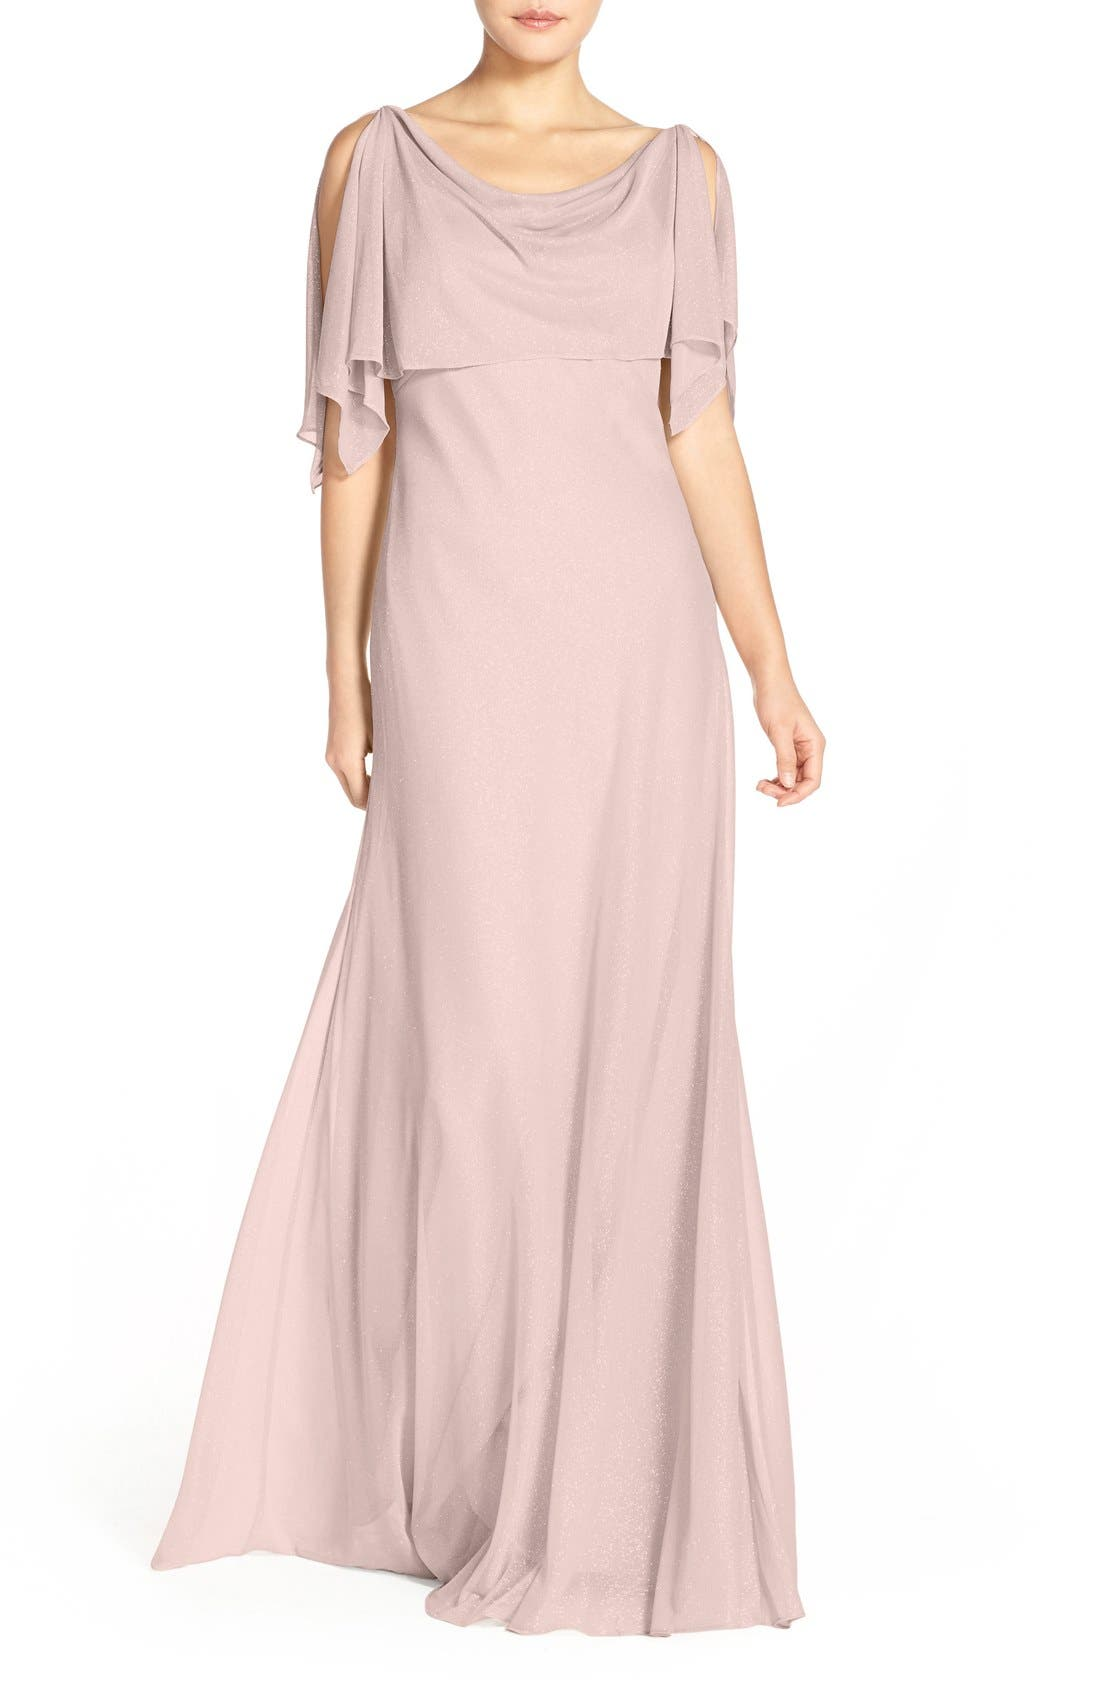 Womens Beige Sale Dresses Nordstrom Jolie Clothing Joie Midi Dress Nude L